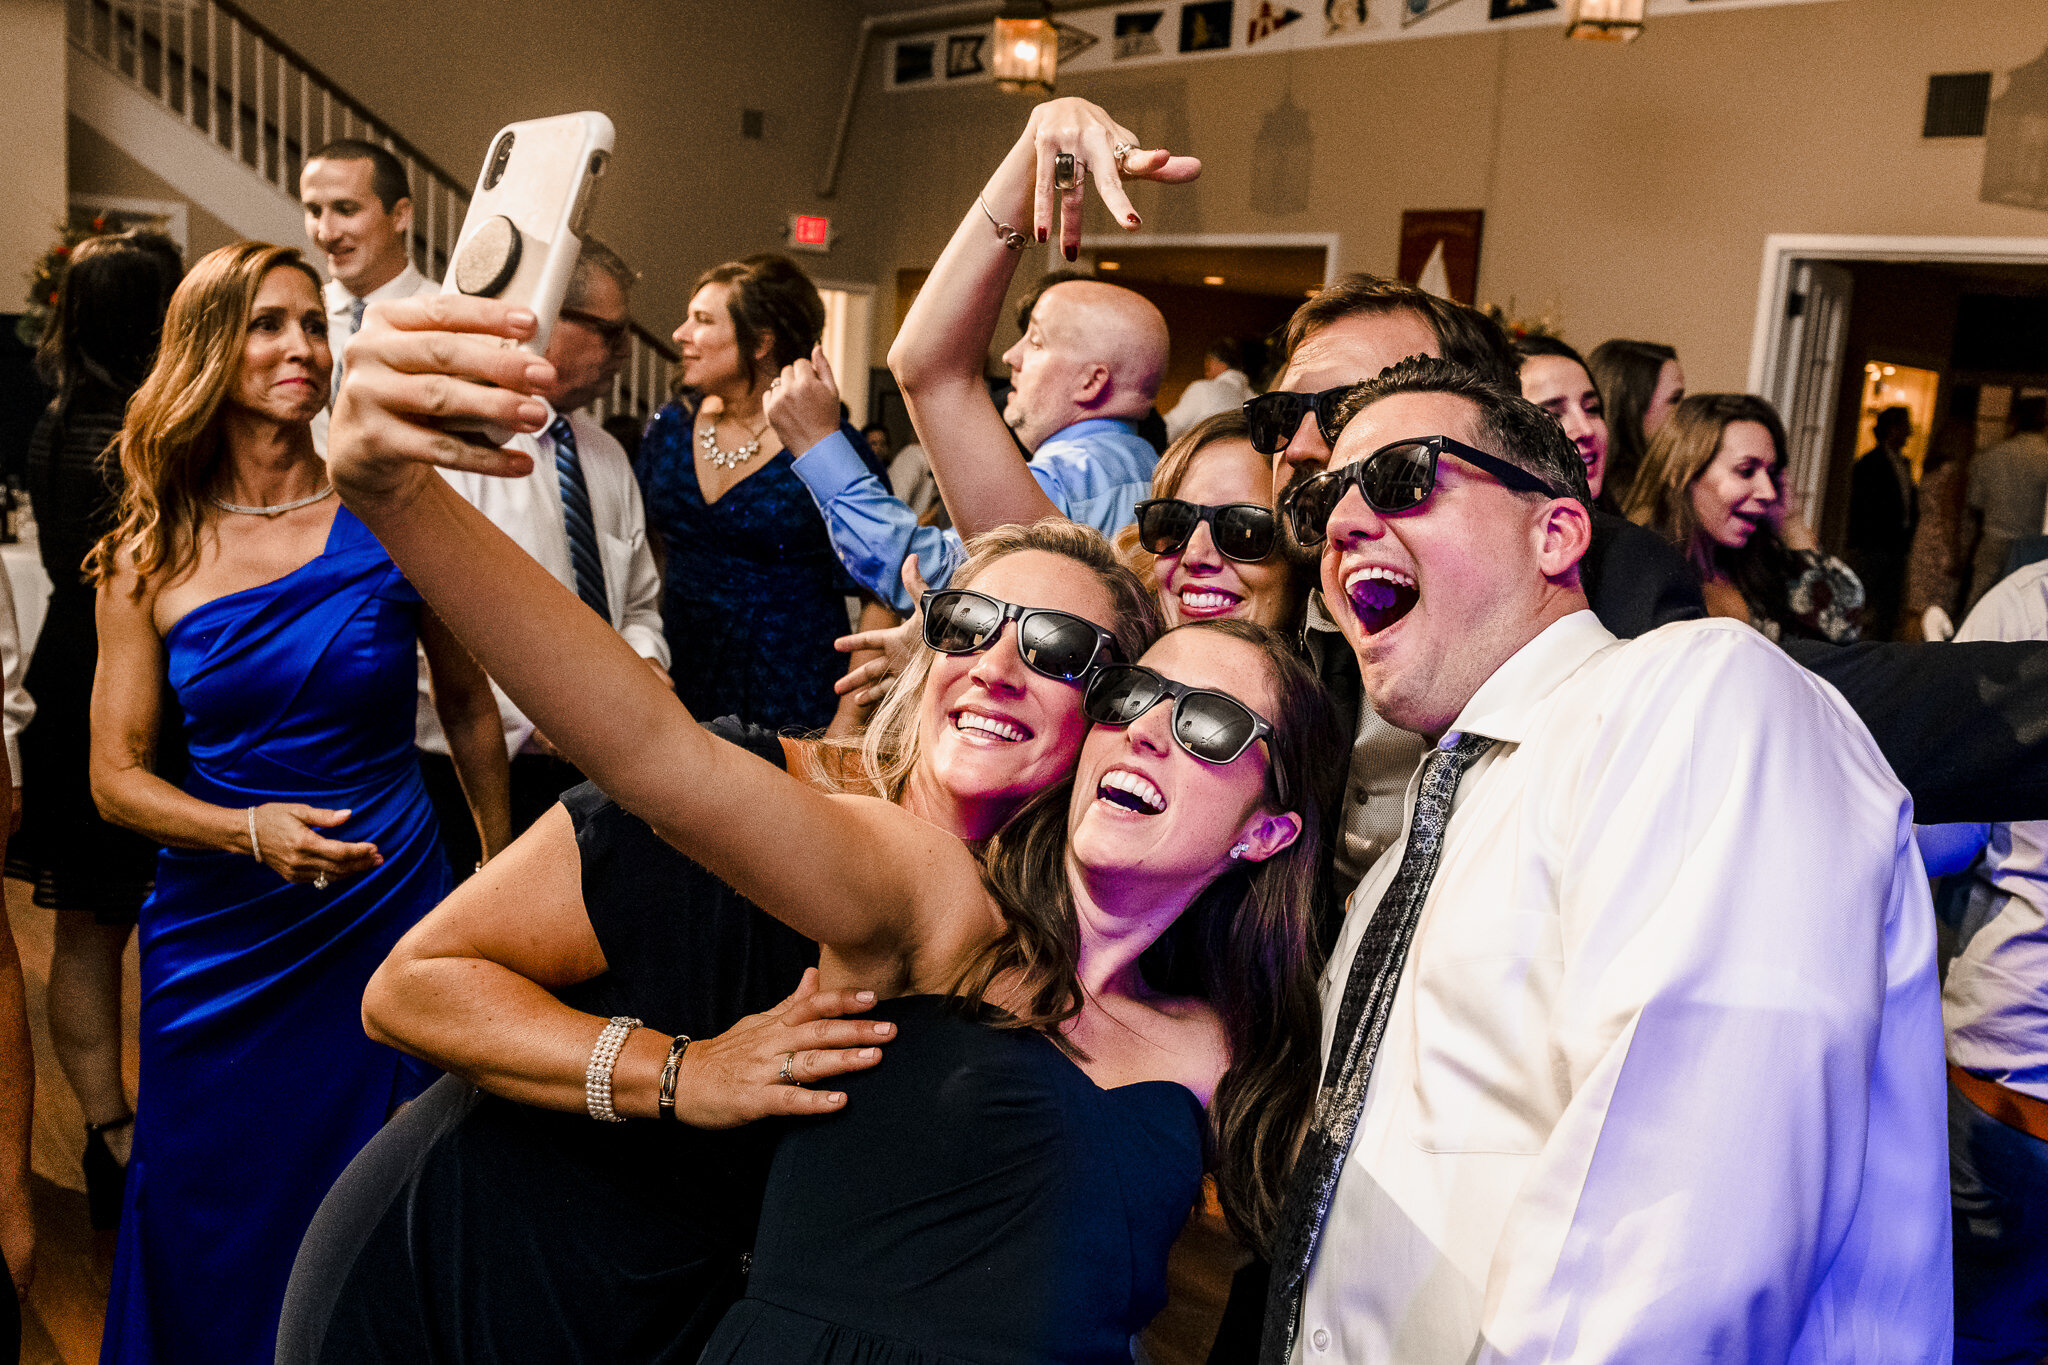 Snell-Ocean-City-Yacht-Club-New-Jersey-Wedding-Photographer-38.JPG